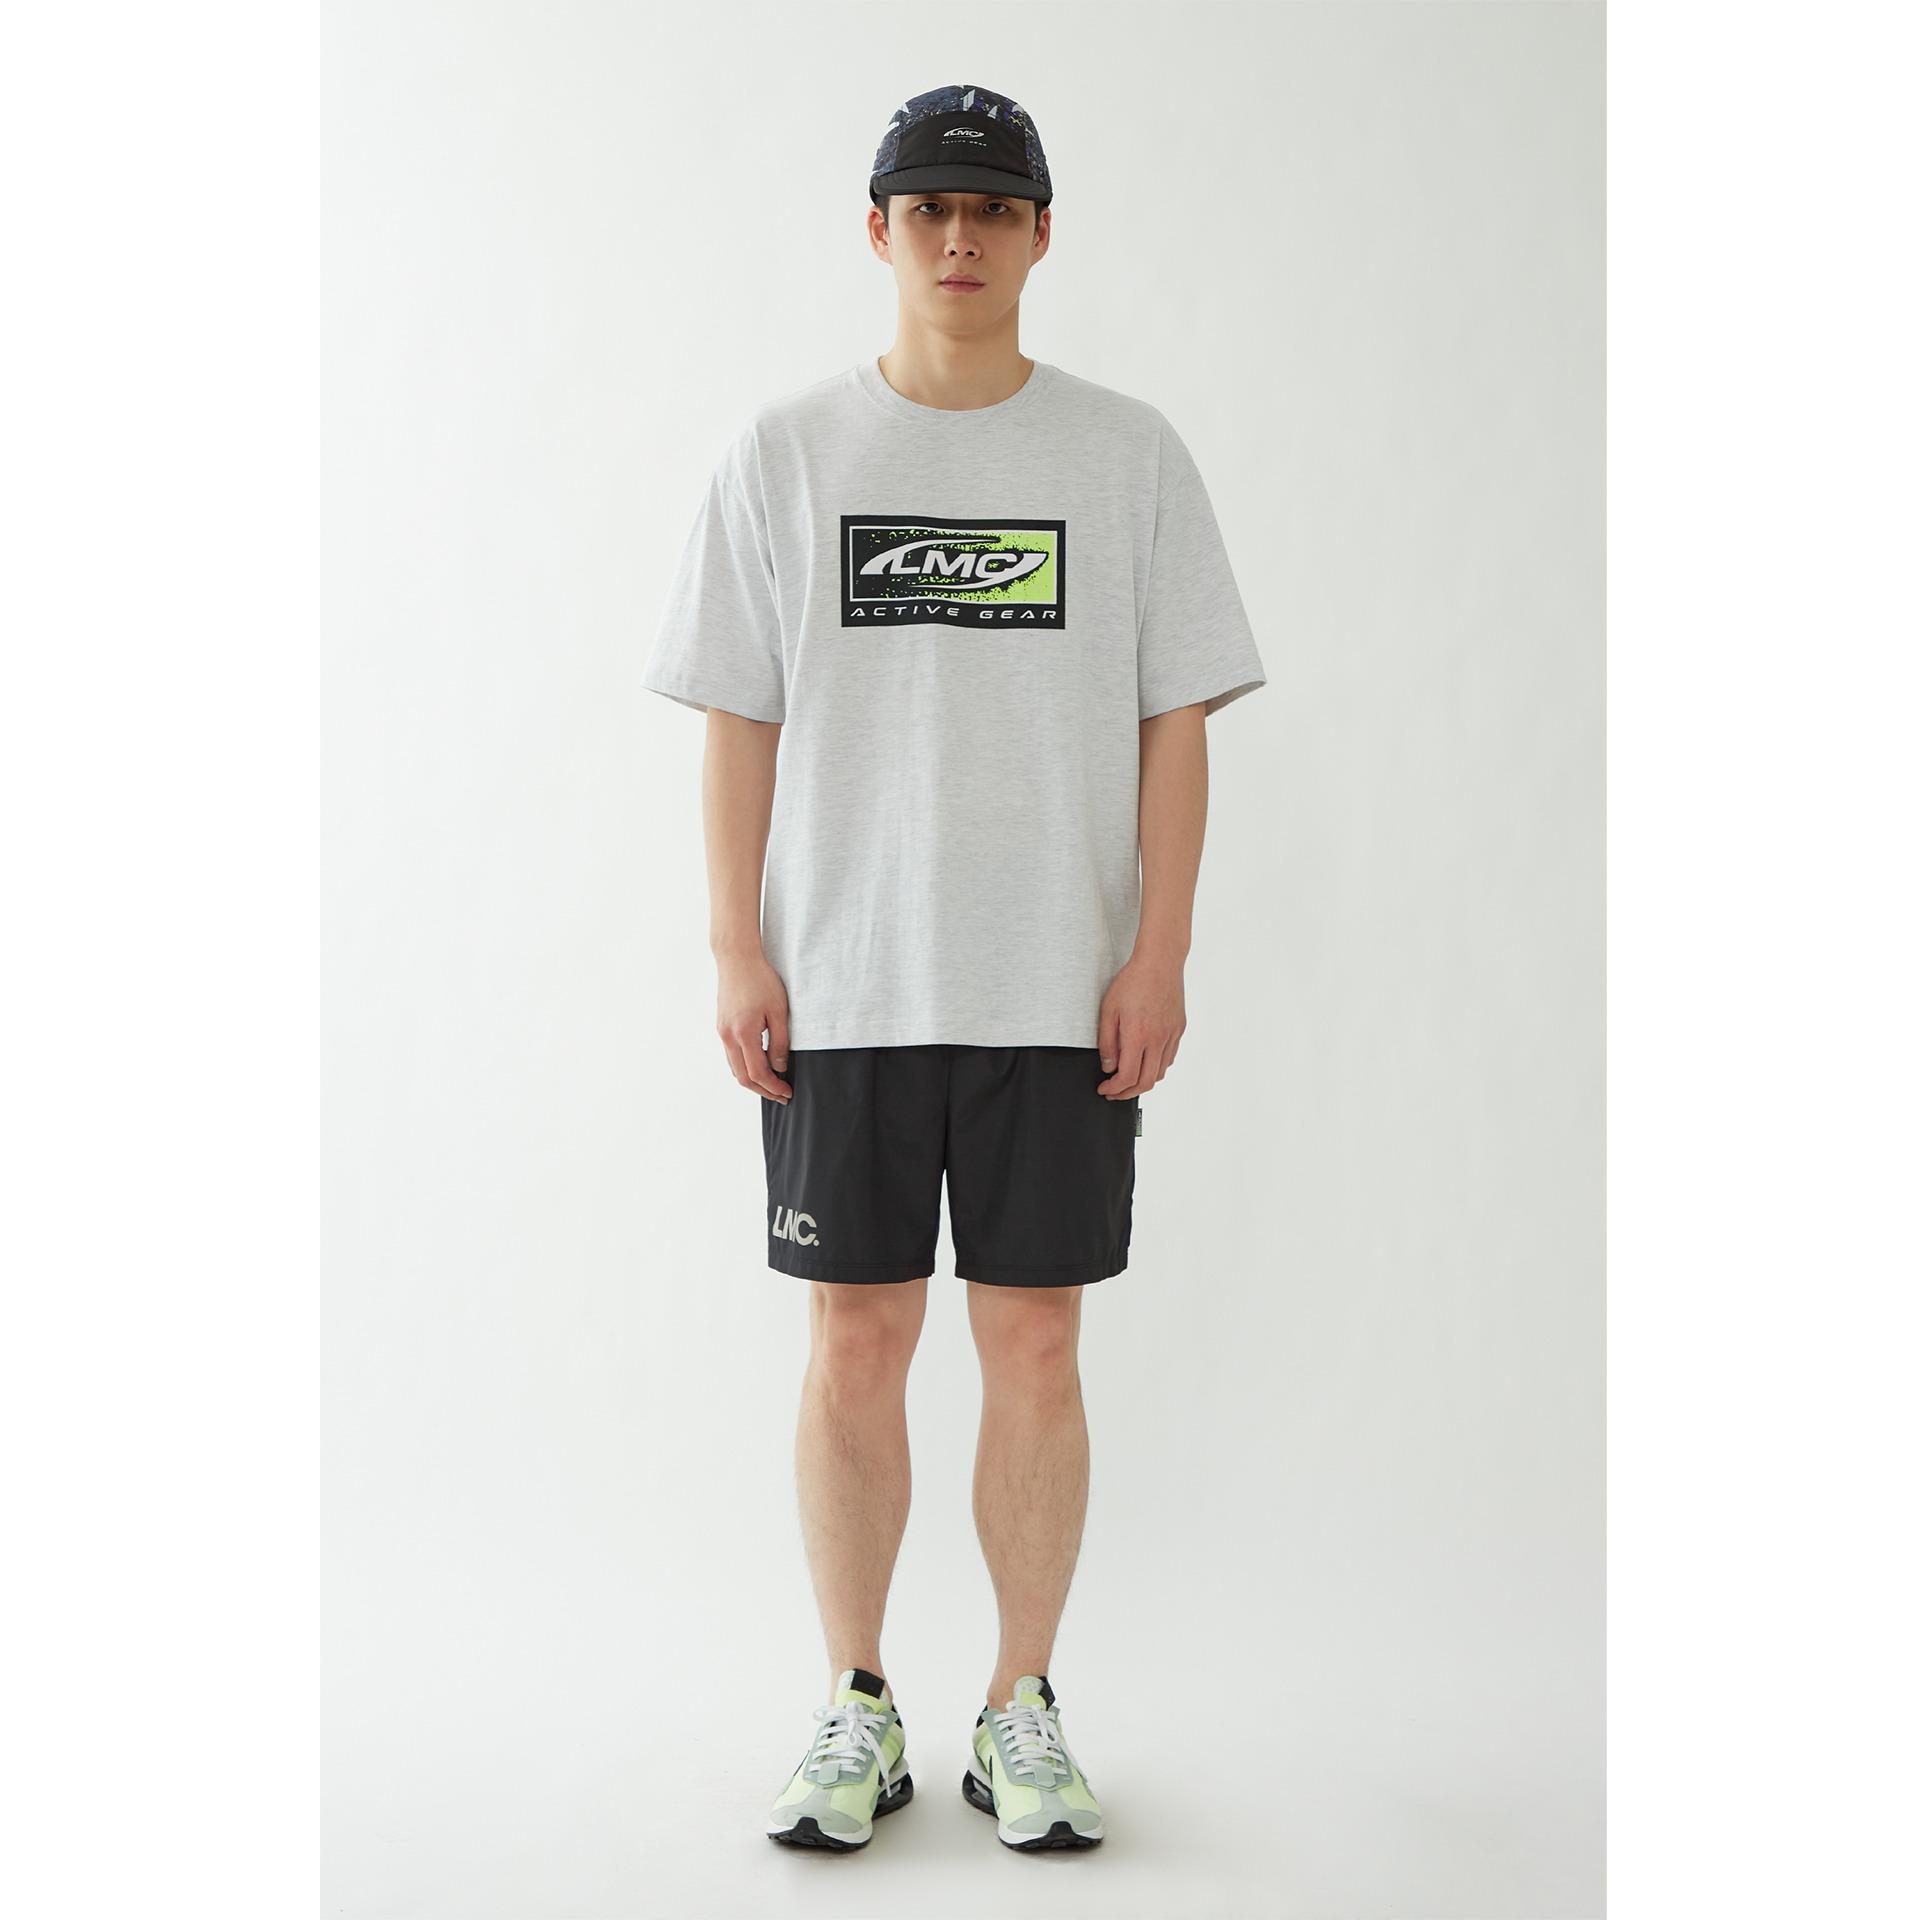 layer-LMC BOX ACTIVE GEAR TEE lt. heather gray♡韓國男裝上衣